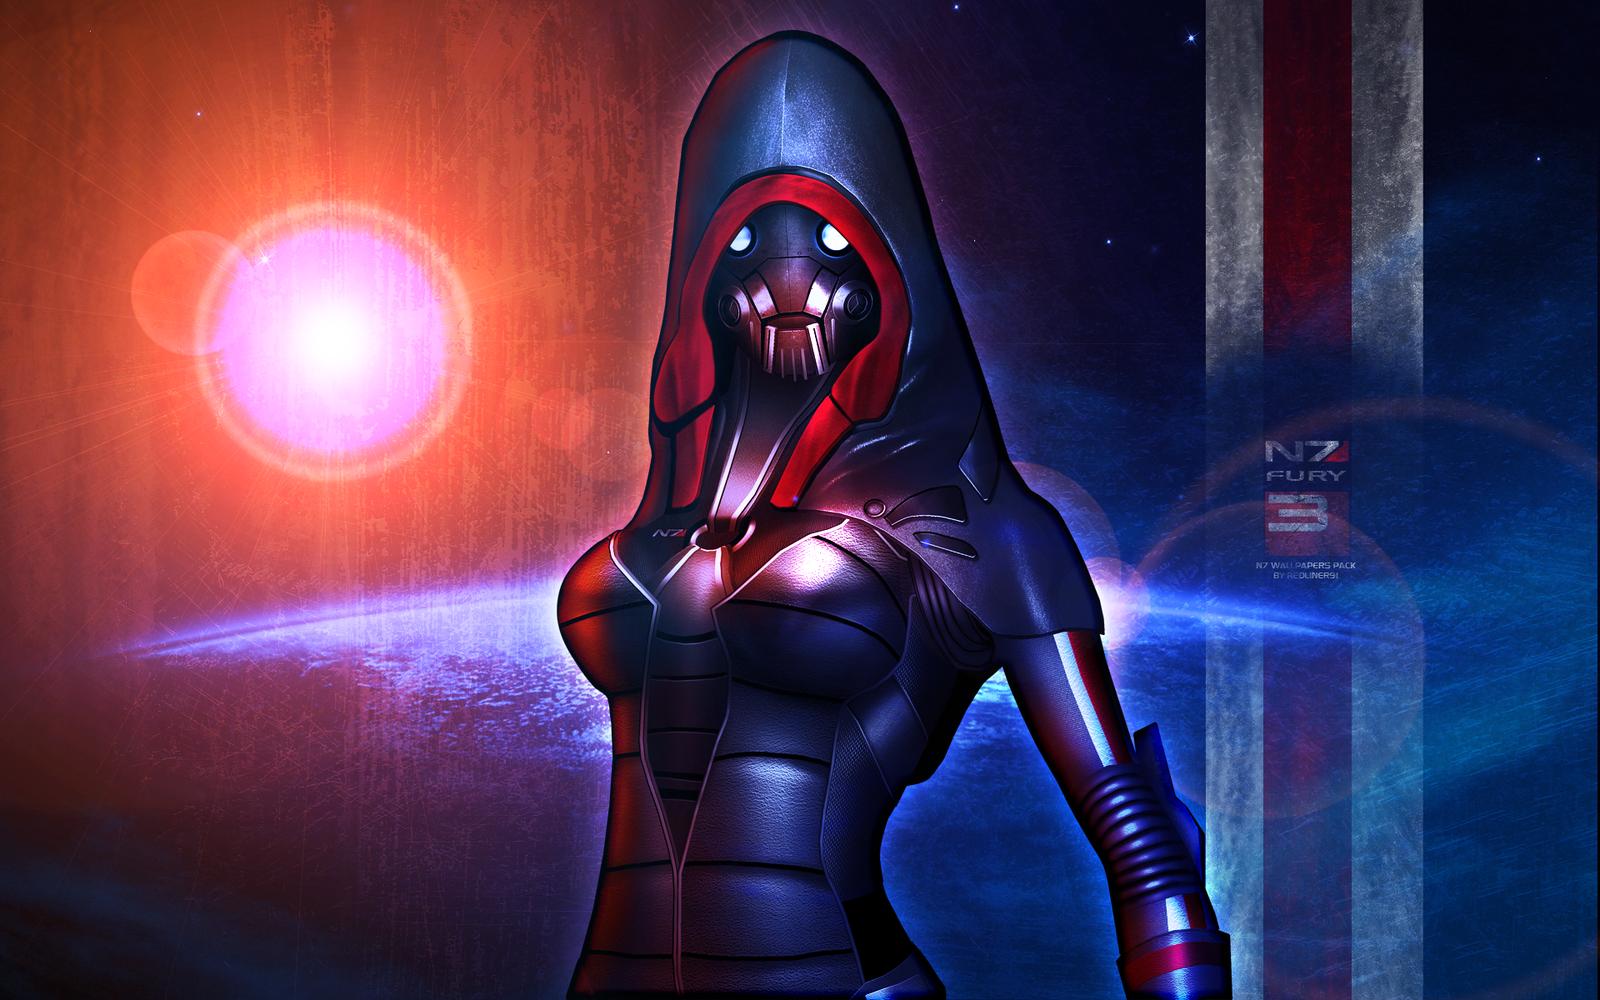 Mass Effect 3 N7 Fury Wallpaper (2012) by RedLineR91